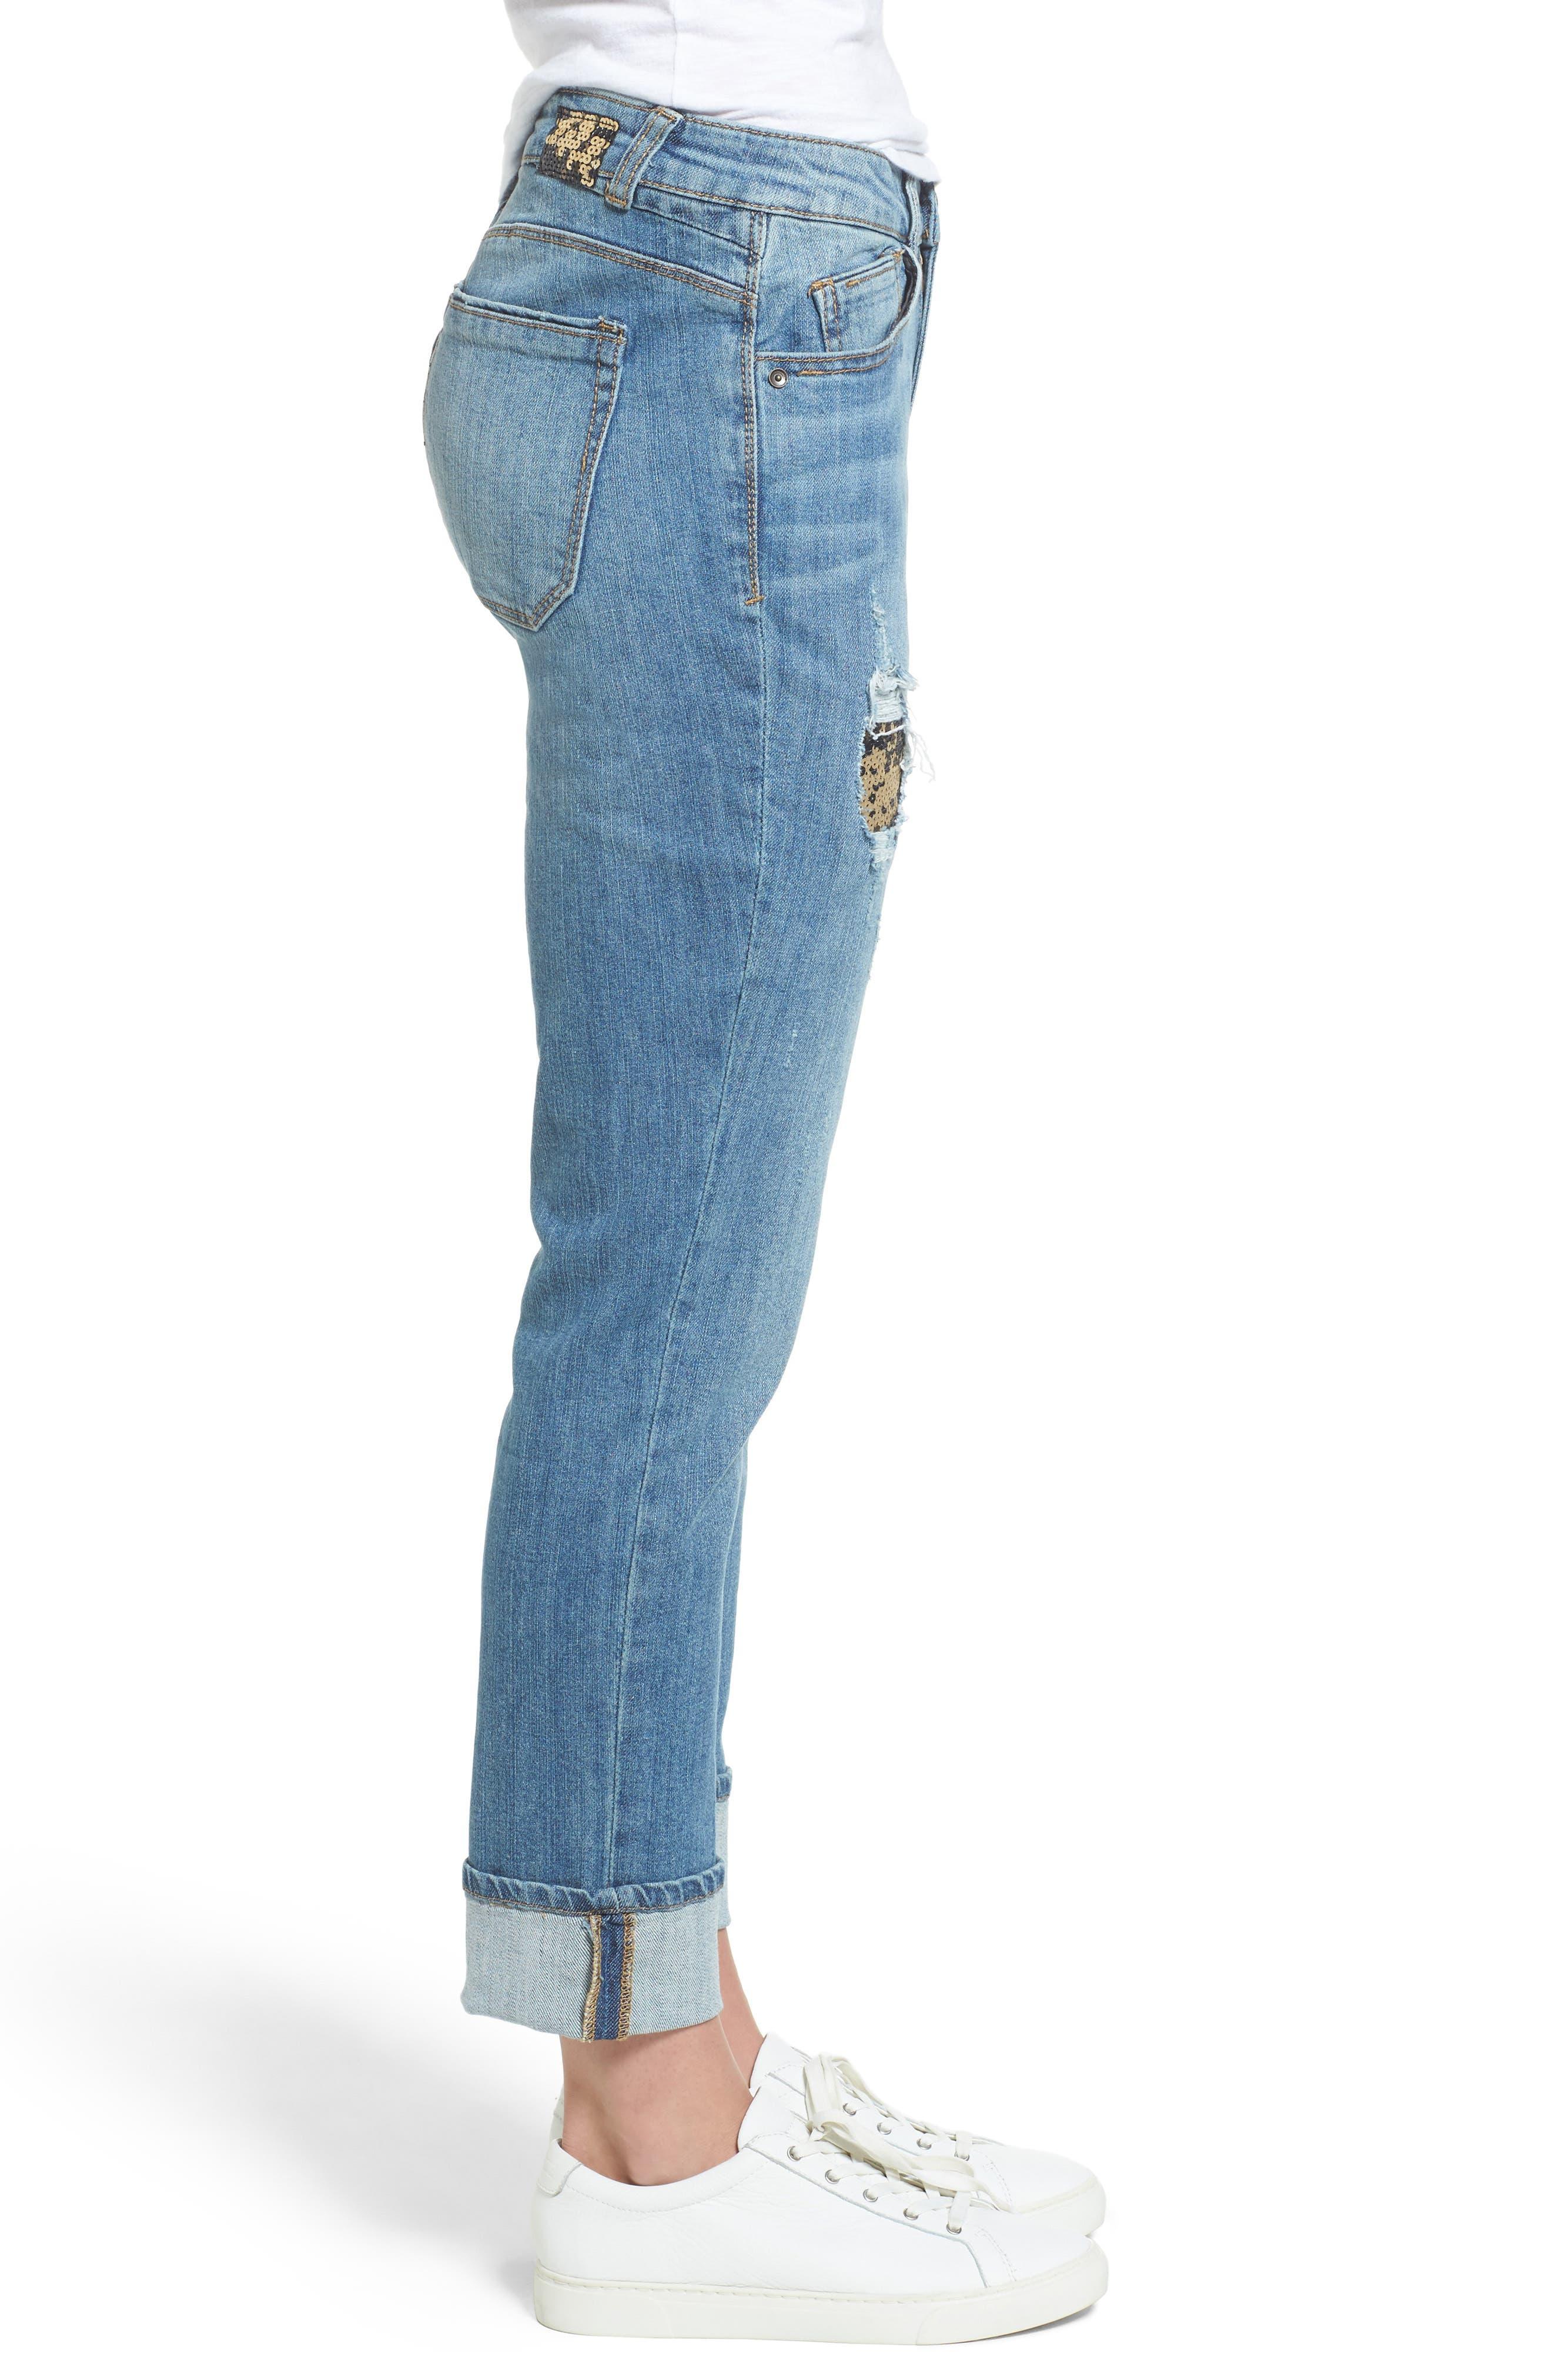 Alternate Image 3  - Wit & Wisdom Flexellent Skinny Girlfriend Jeans (Nordstrom Exclusive)